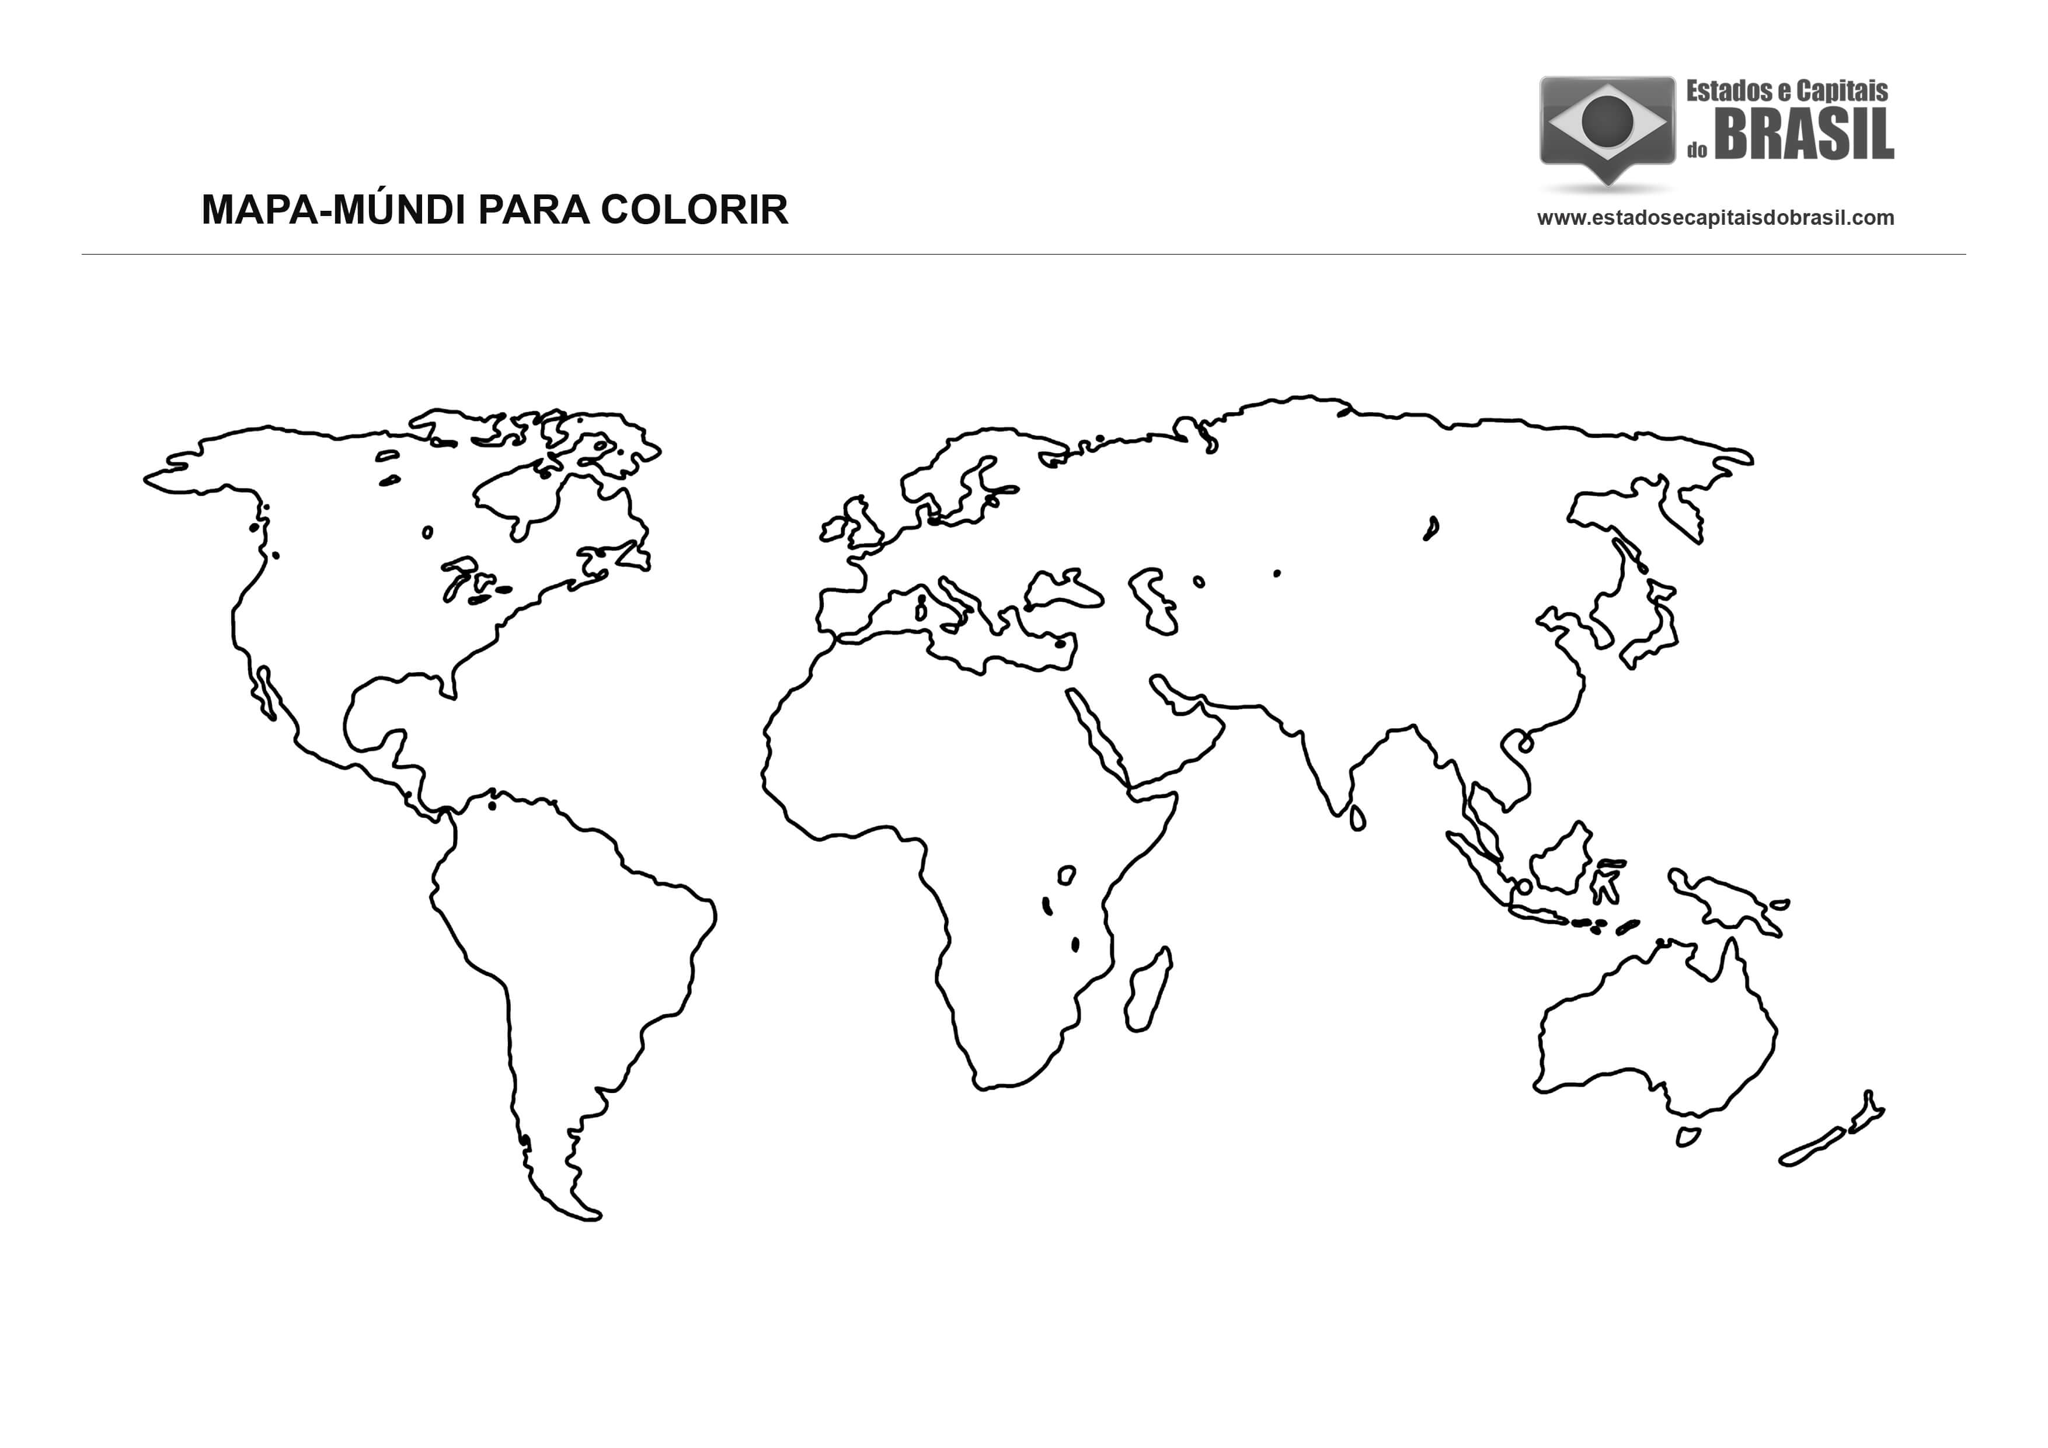 Mapa-Múndi para colorir (continentes)